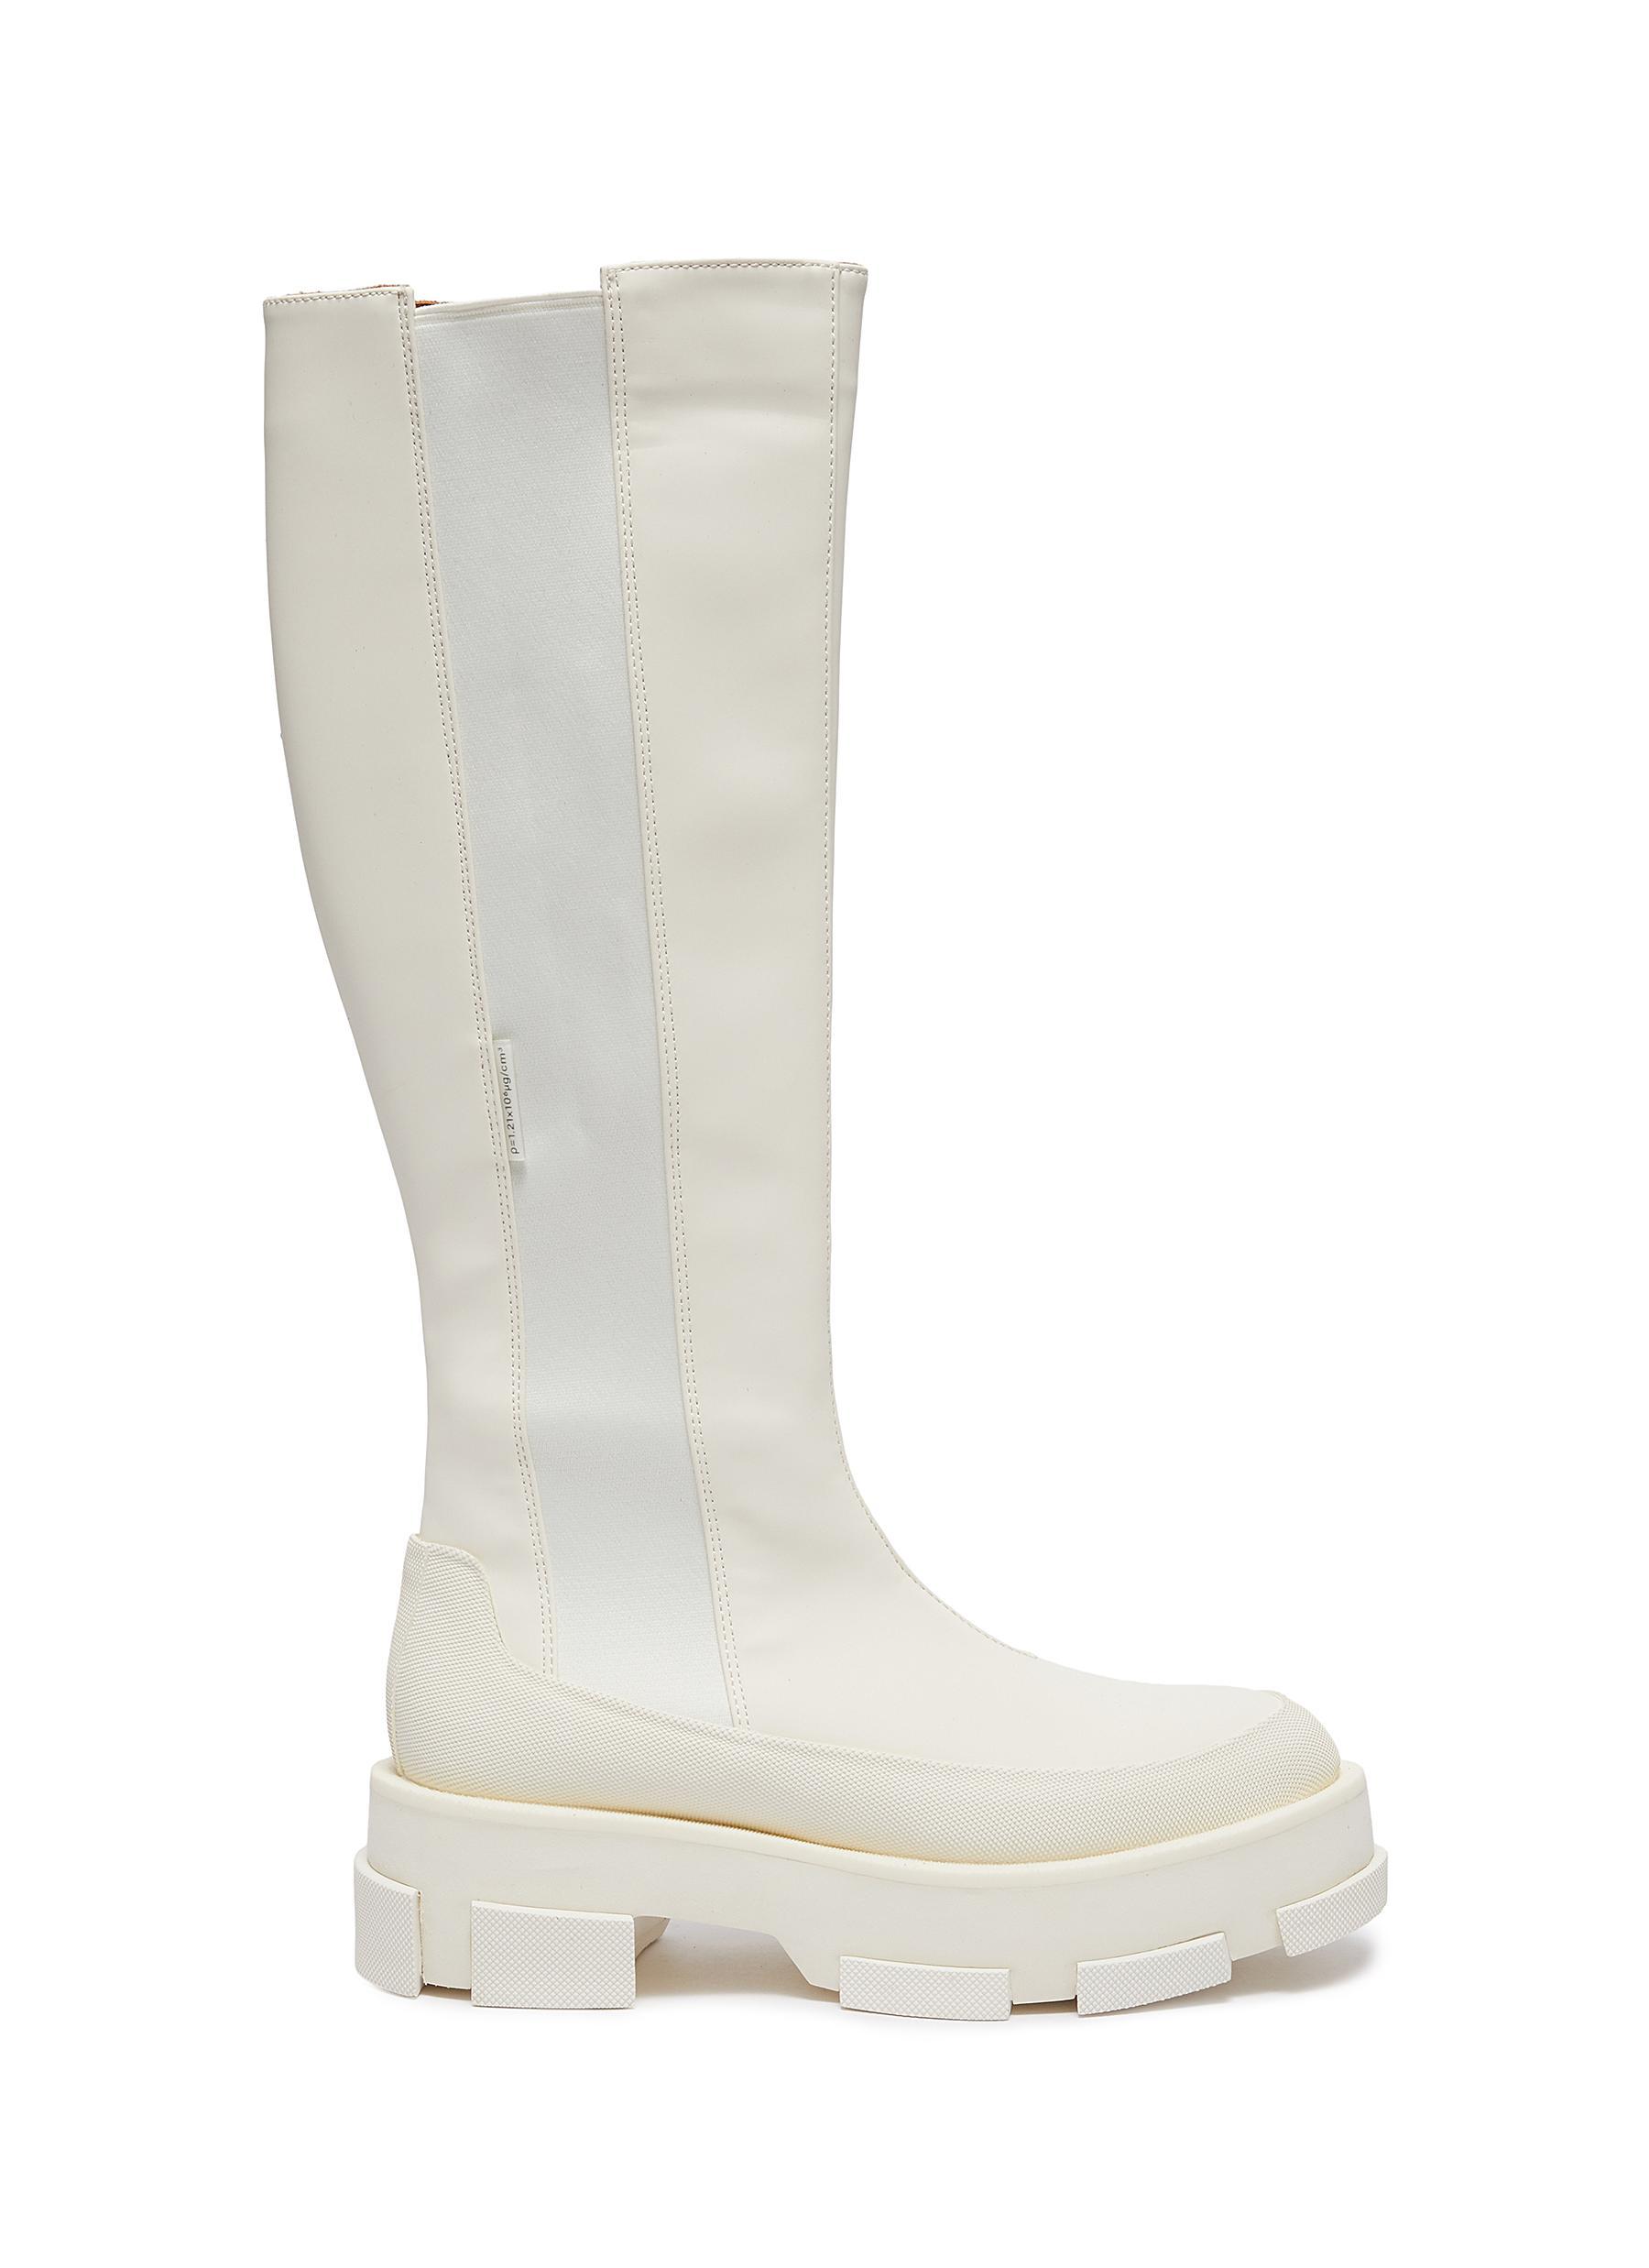 Gao Combat Platform Leather Boots